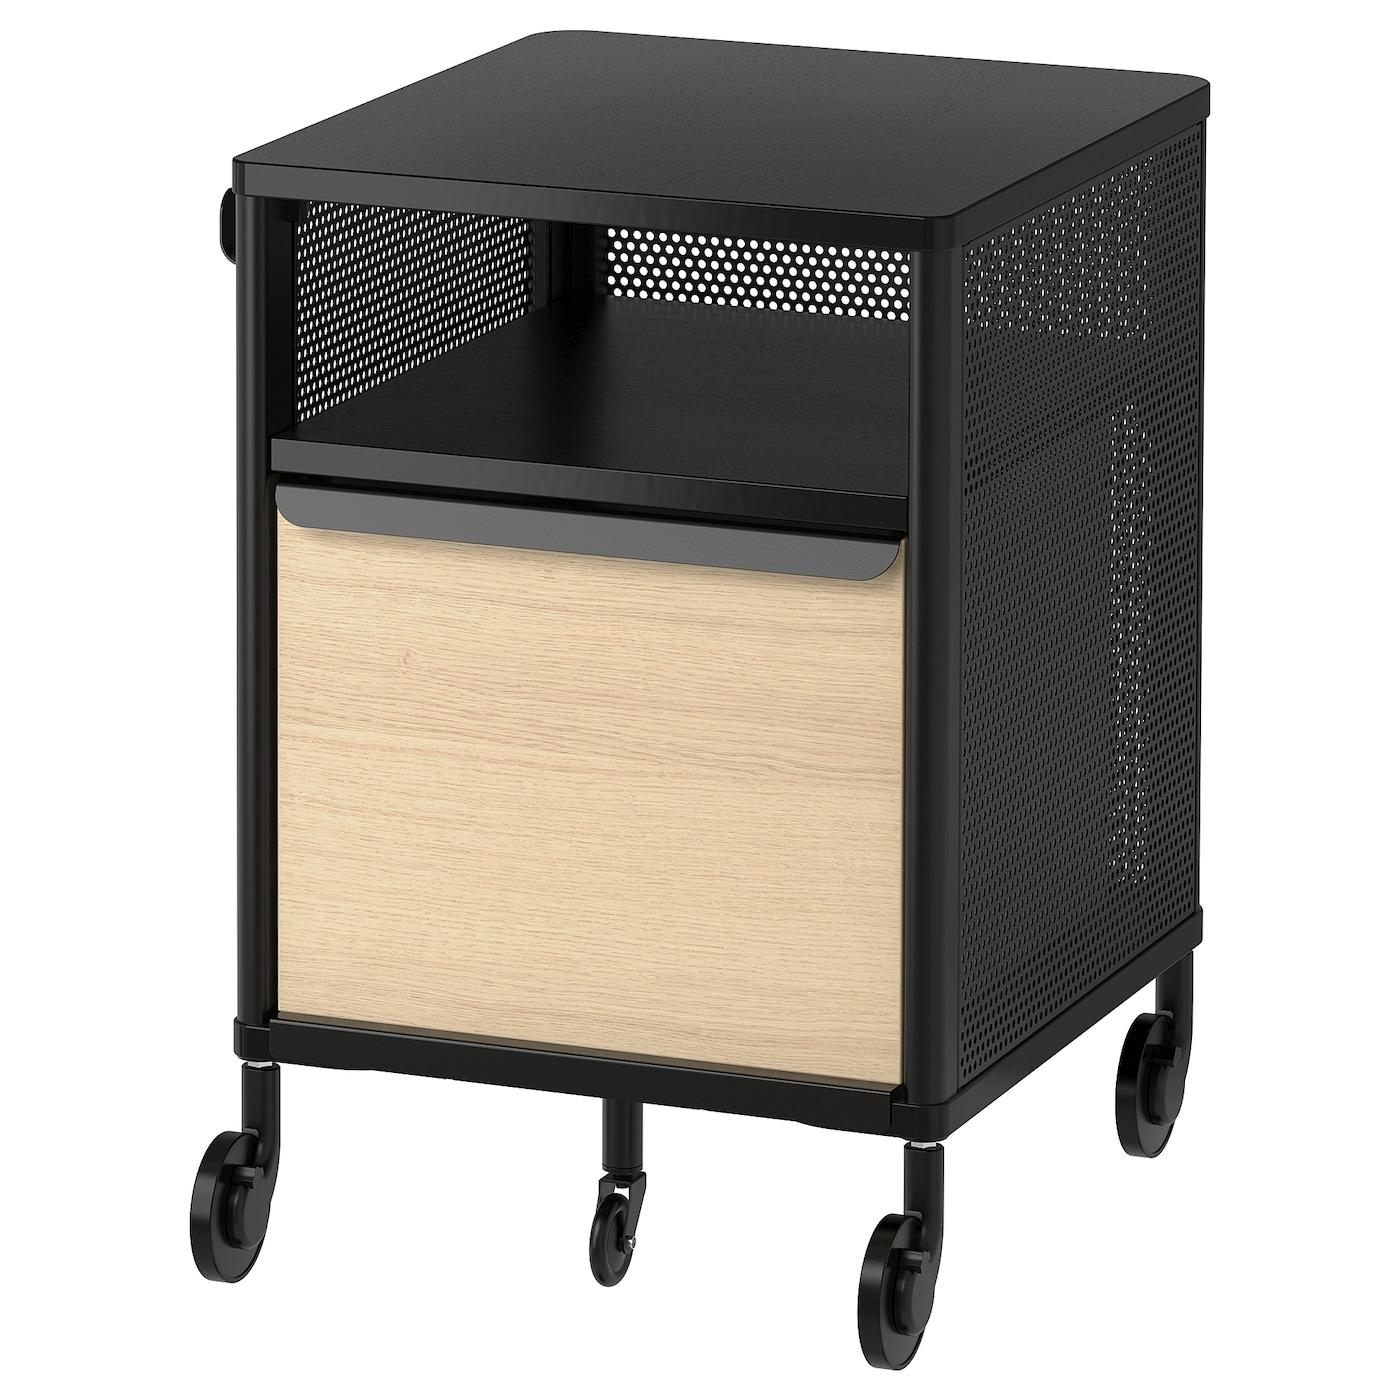 armoires de bureau, etagères de bureau - ikea belgique